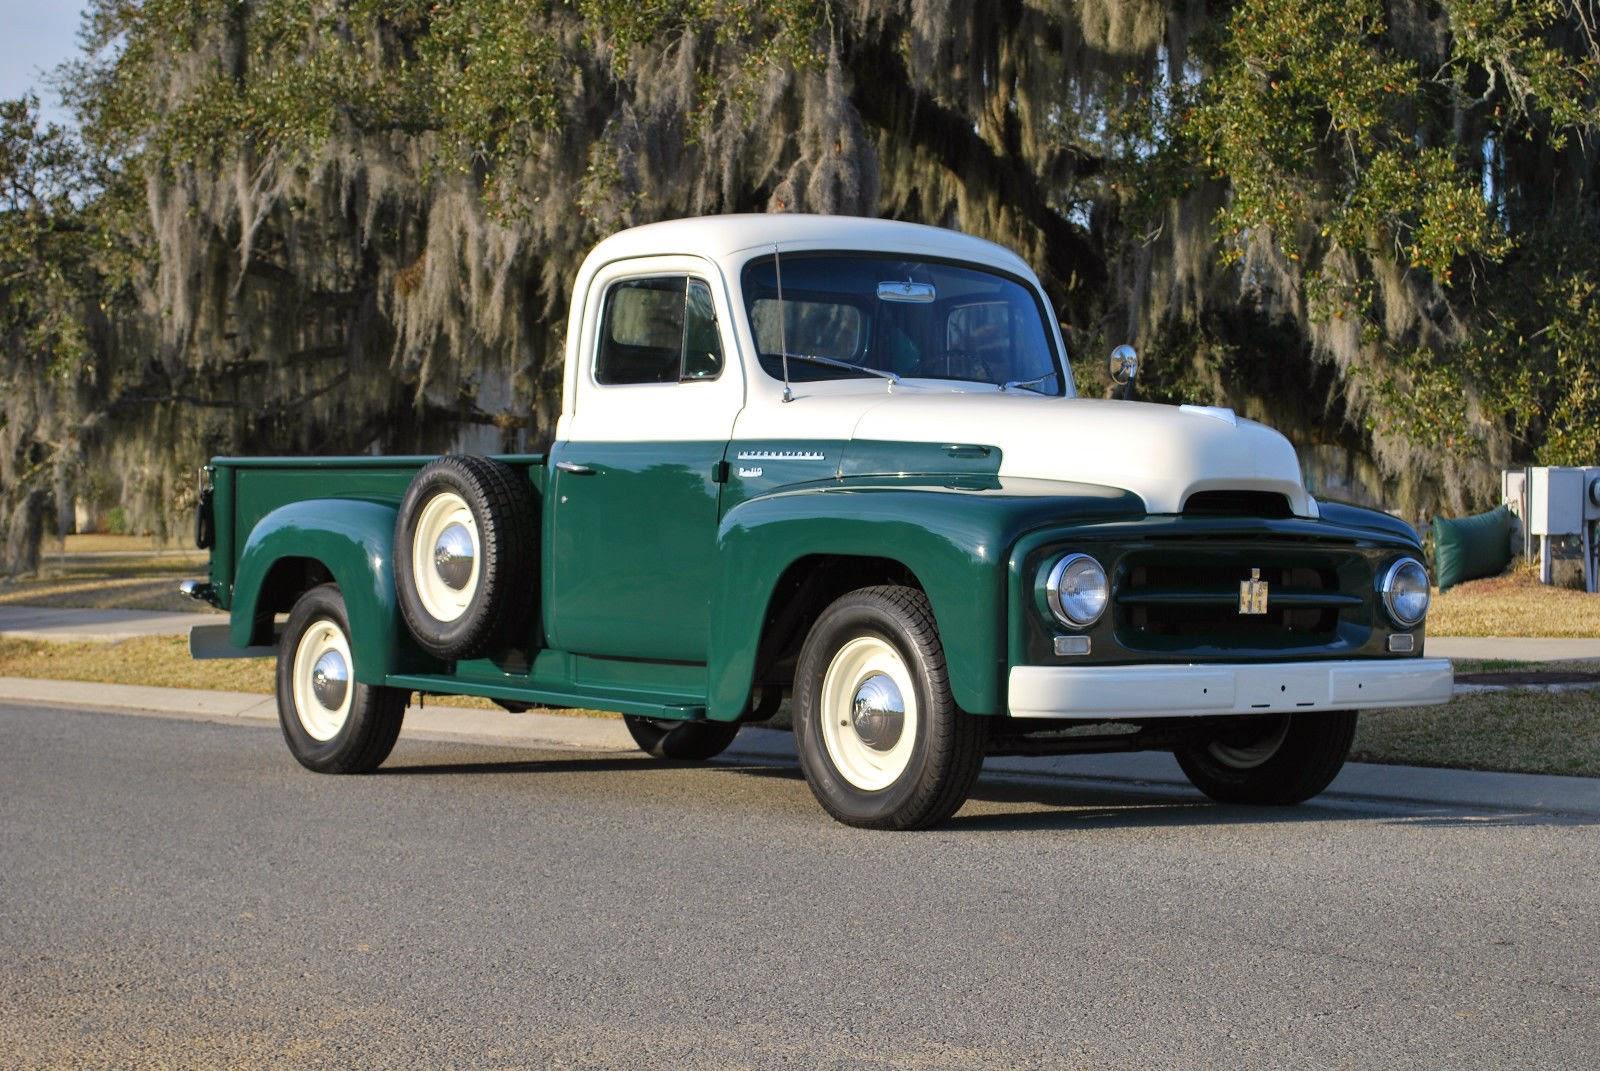 All American Classic Cars 1954 Ihc International R100 1 2 Ton Pickup Truck